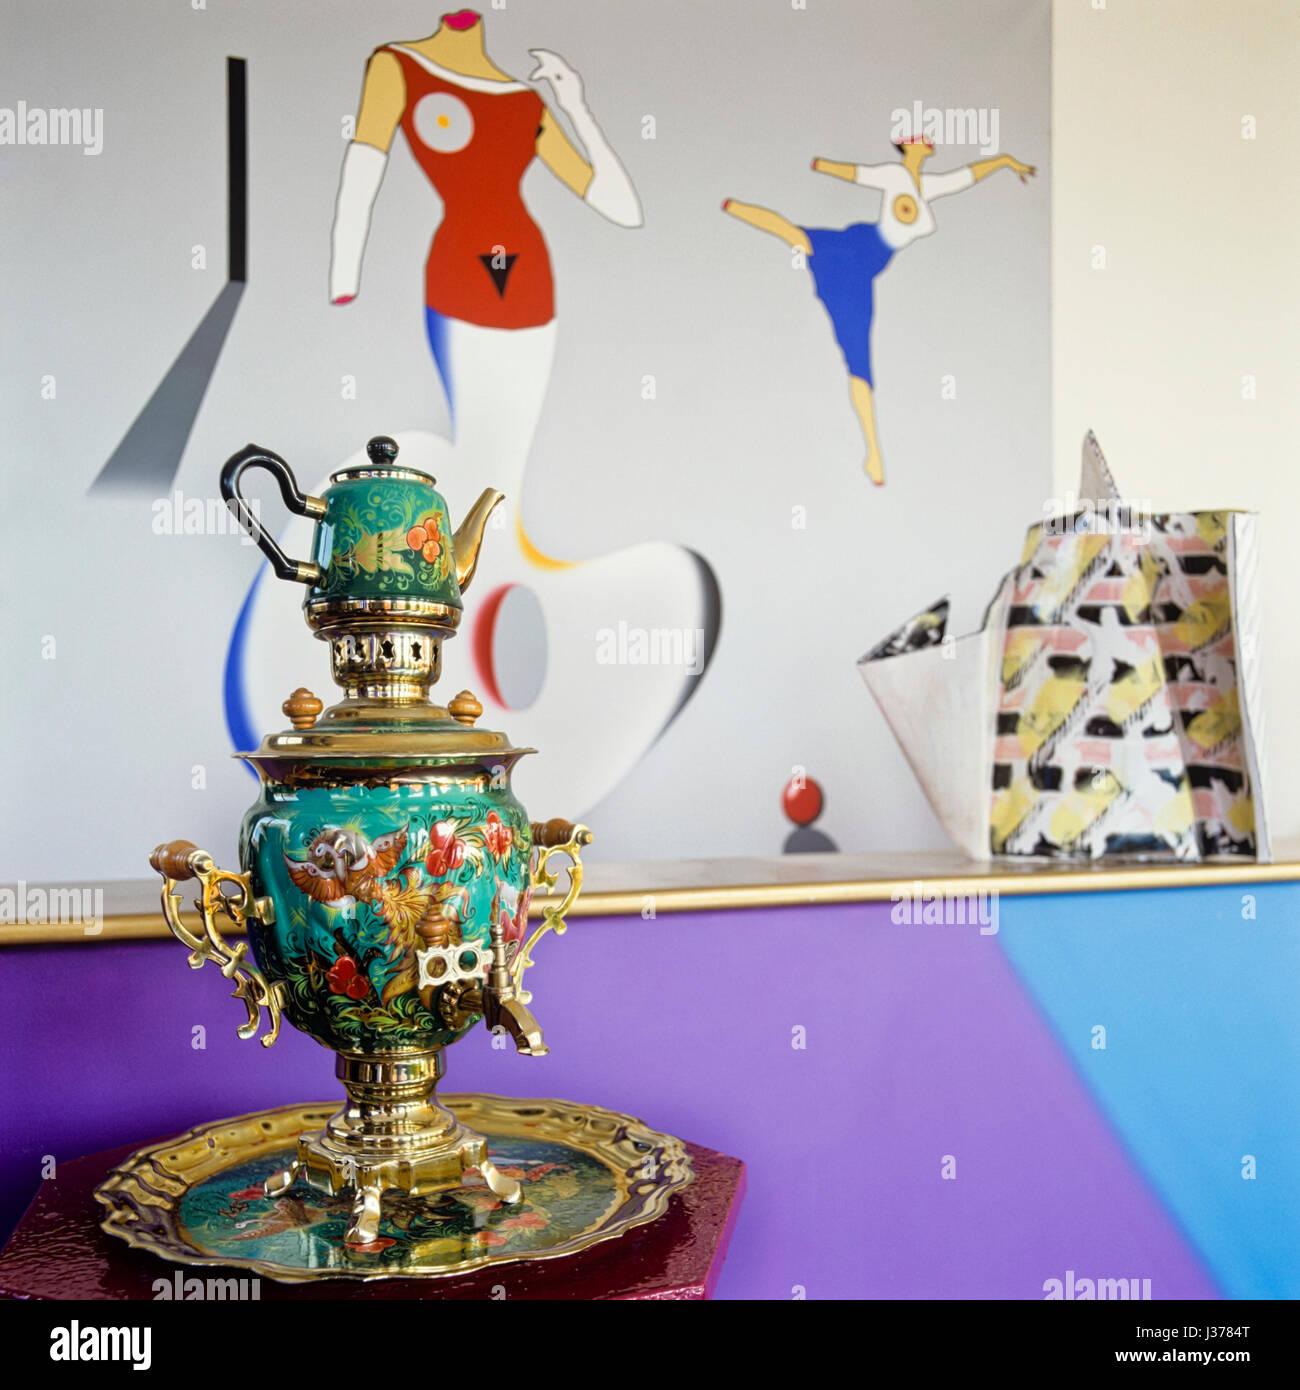 Tea pot beside painted wall. - Stock Image